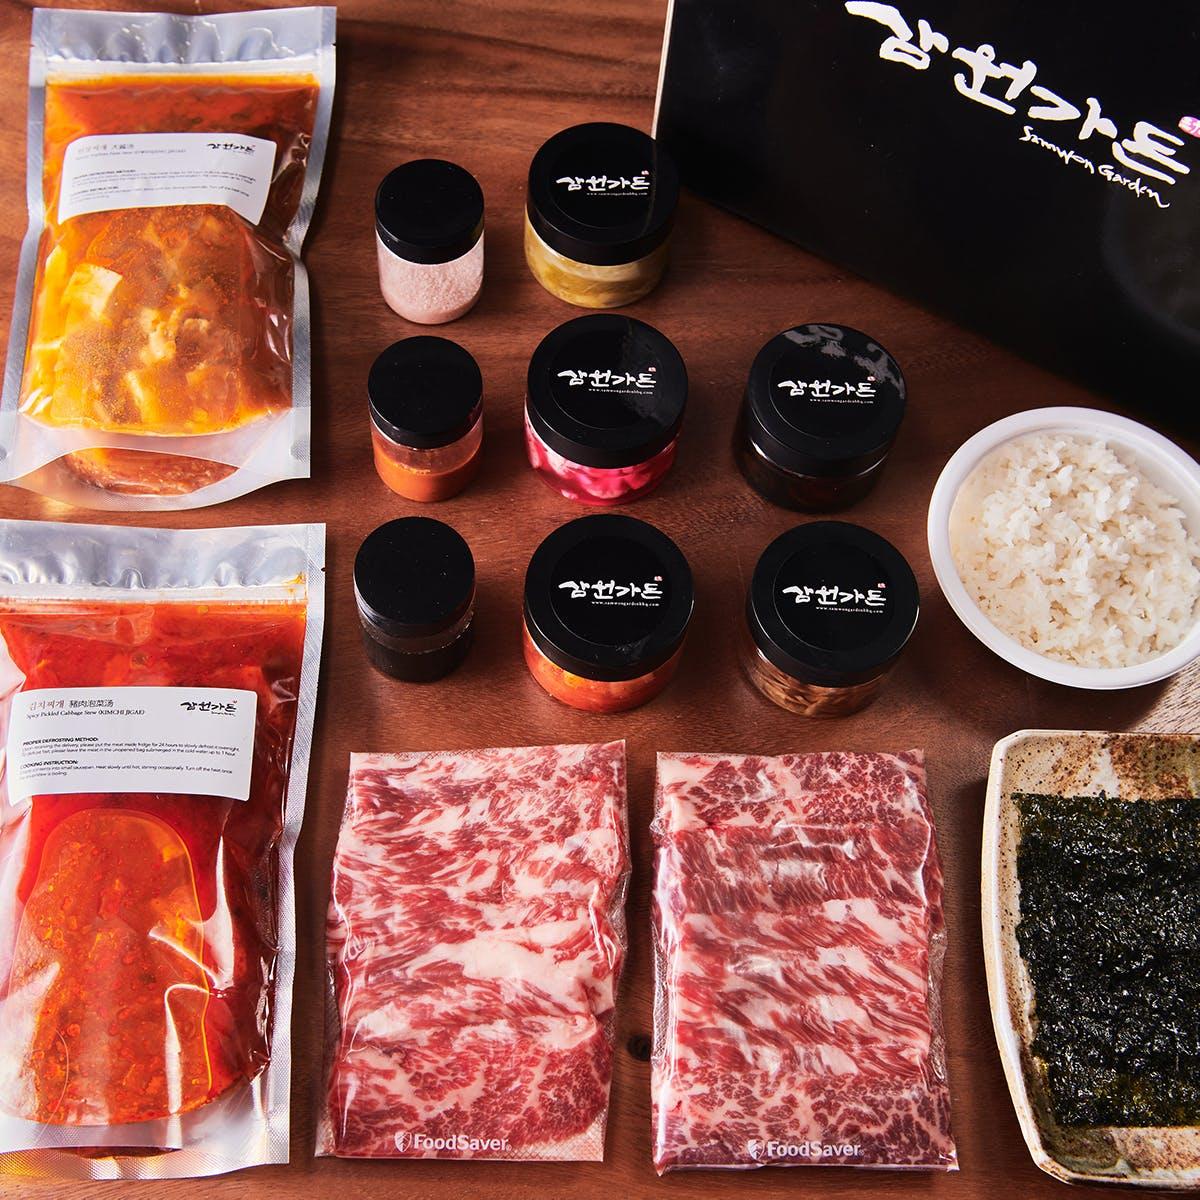 Samwon Garden Korean BBQ - Korean BBQ Short Rib Kit for 2-4